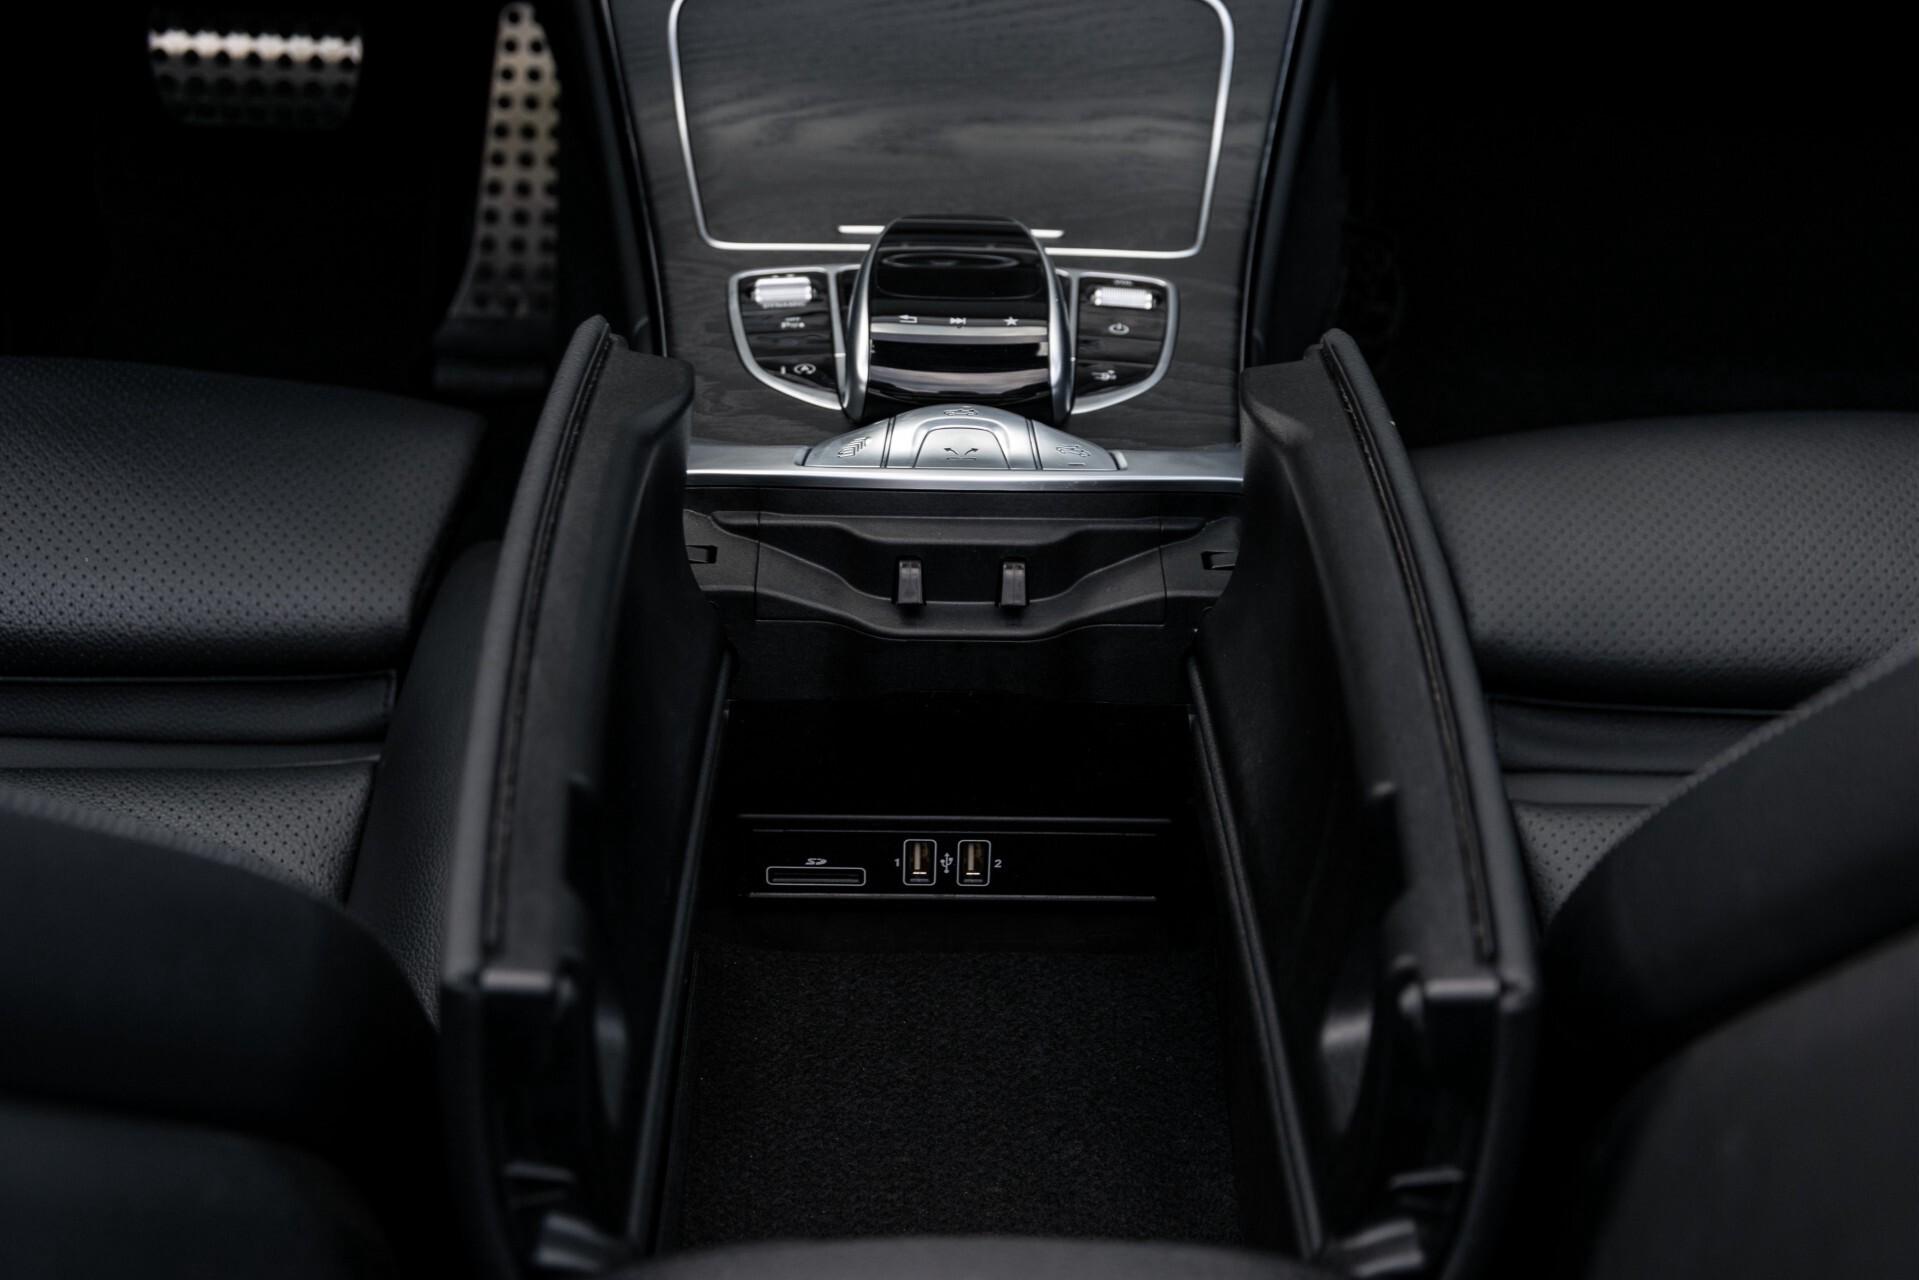 Mercedes-Benz C-Klasse Cabrio 250 AMG Airscarf/Aircap/Comand/ILS/Camera/Rode cabriokap Aut9 Foto 47